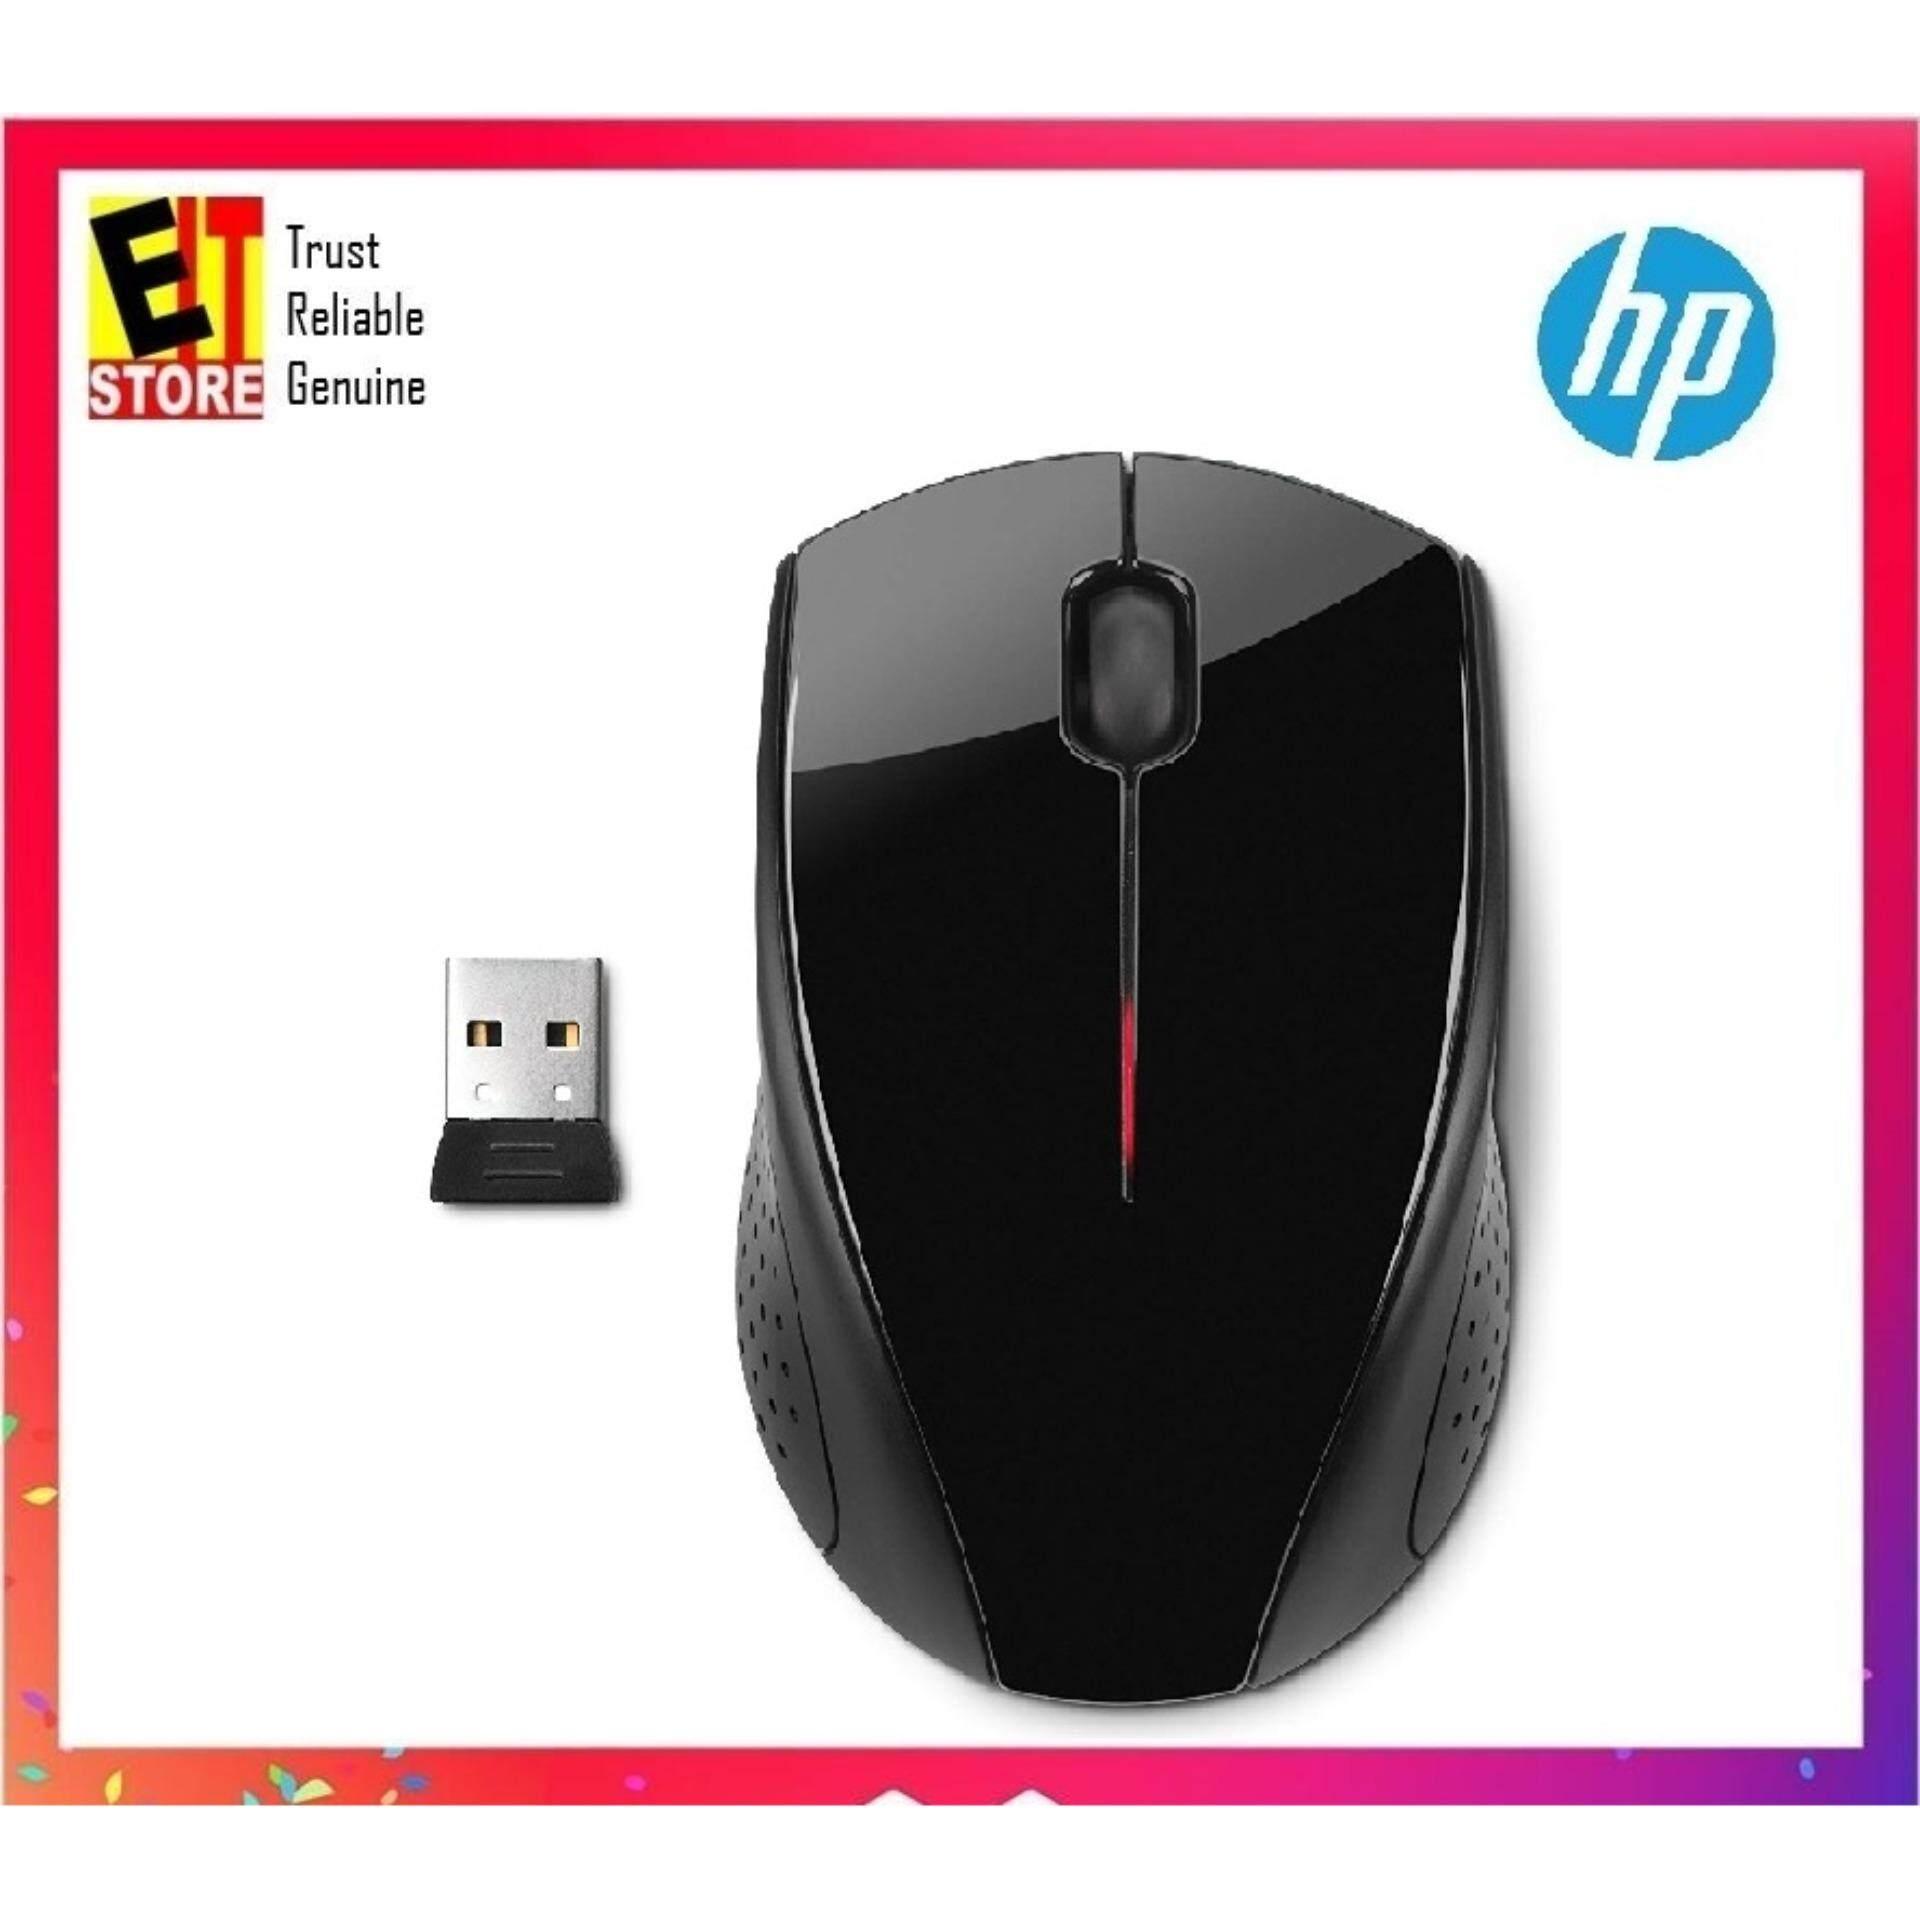 HP Wireless Mouse - X3000 Malaysia